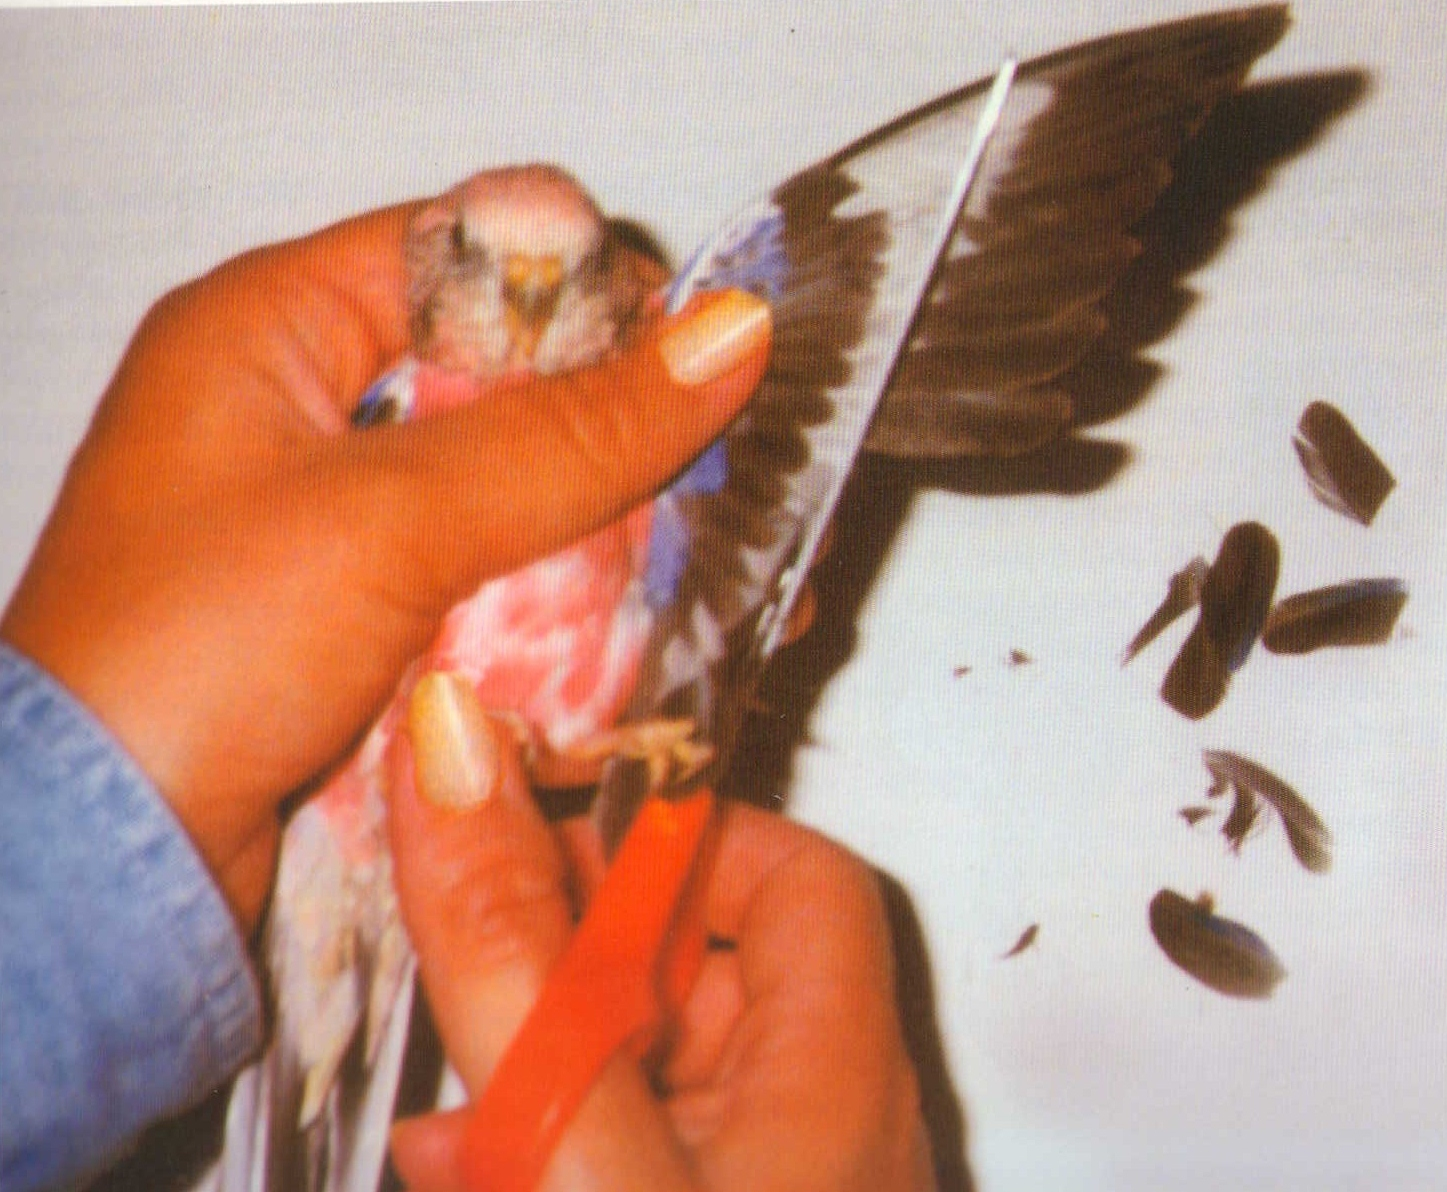 clipping duck wings diagram sony xplod cdx gt250mp wiring the splendid bourke bird blog wing question on